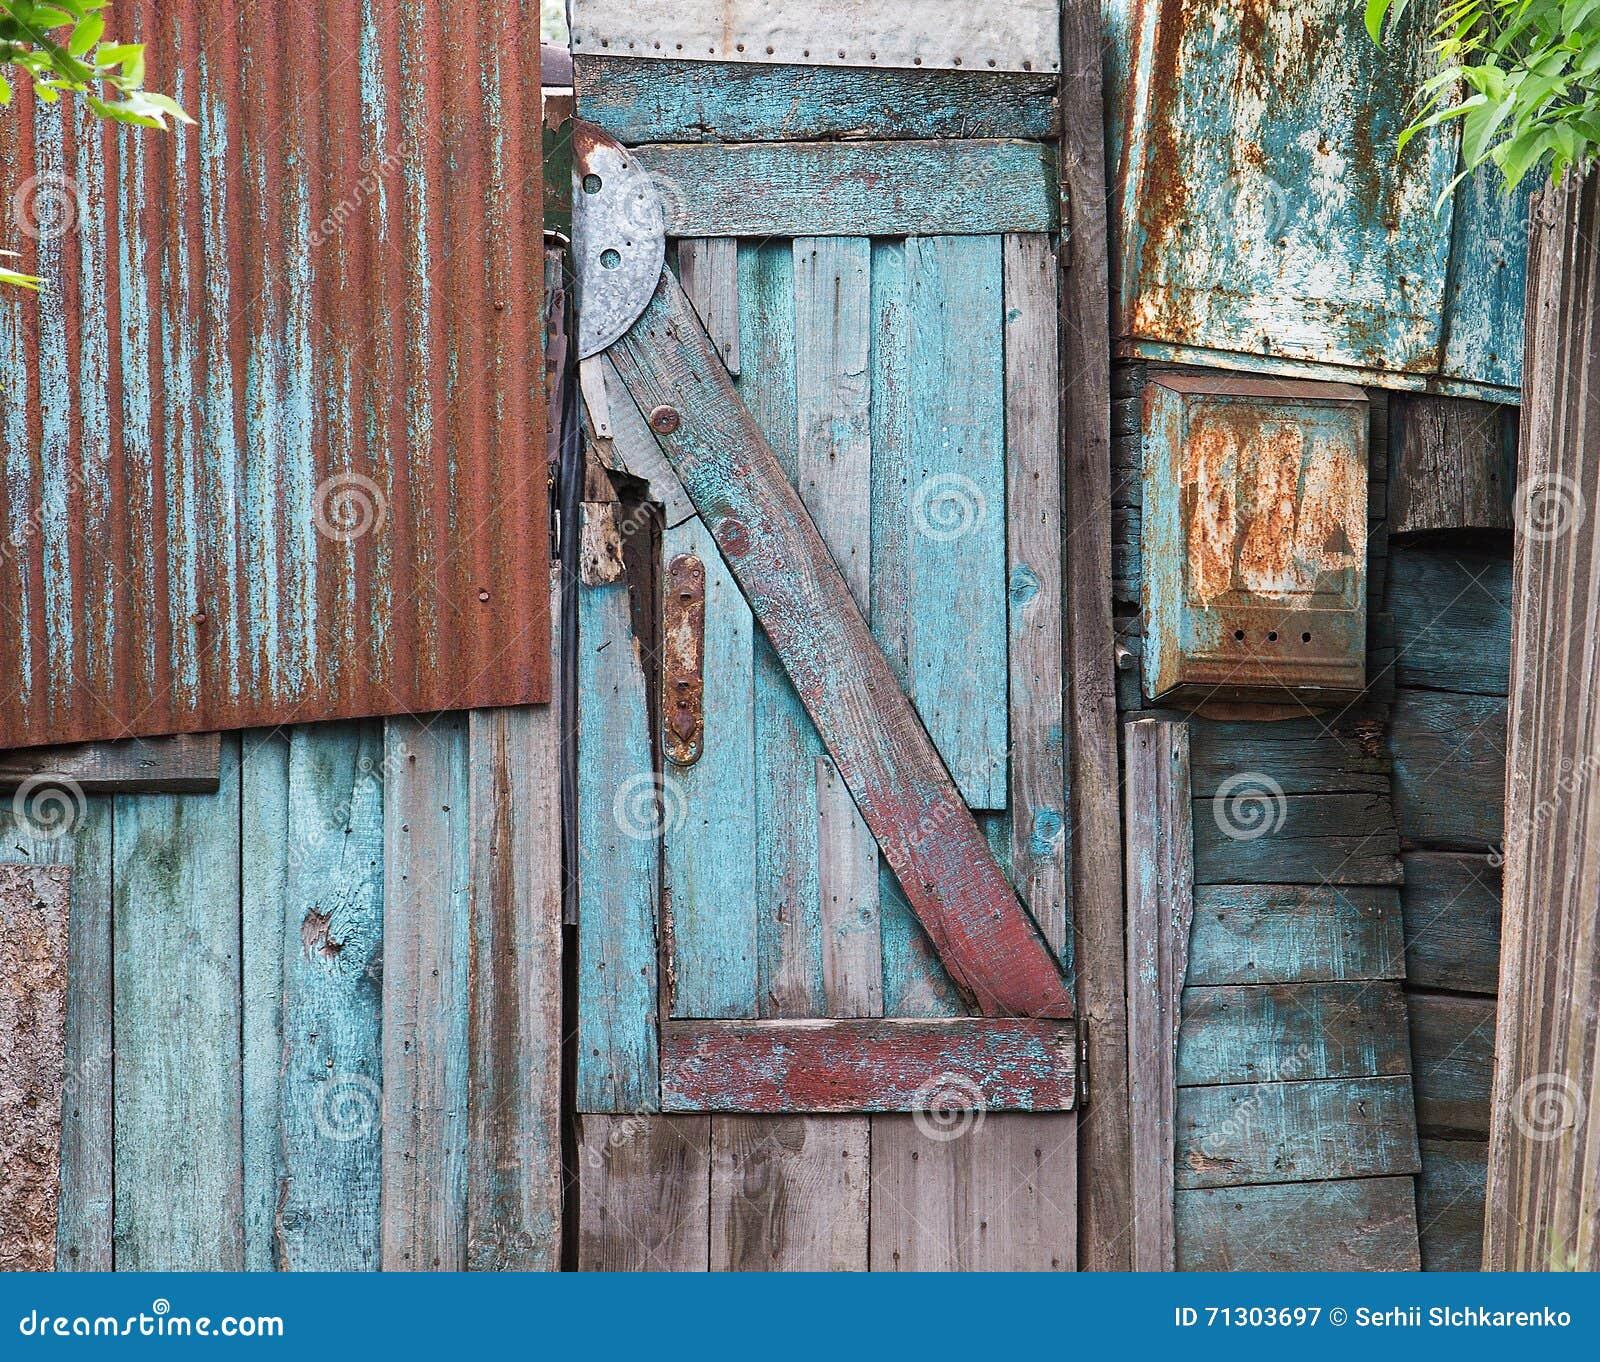 Puertas de madera viejas textura o fondo imagen de for Puertas viejas